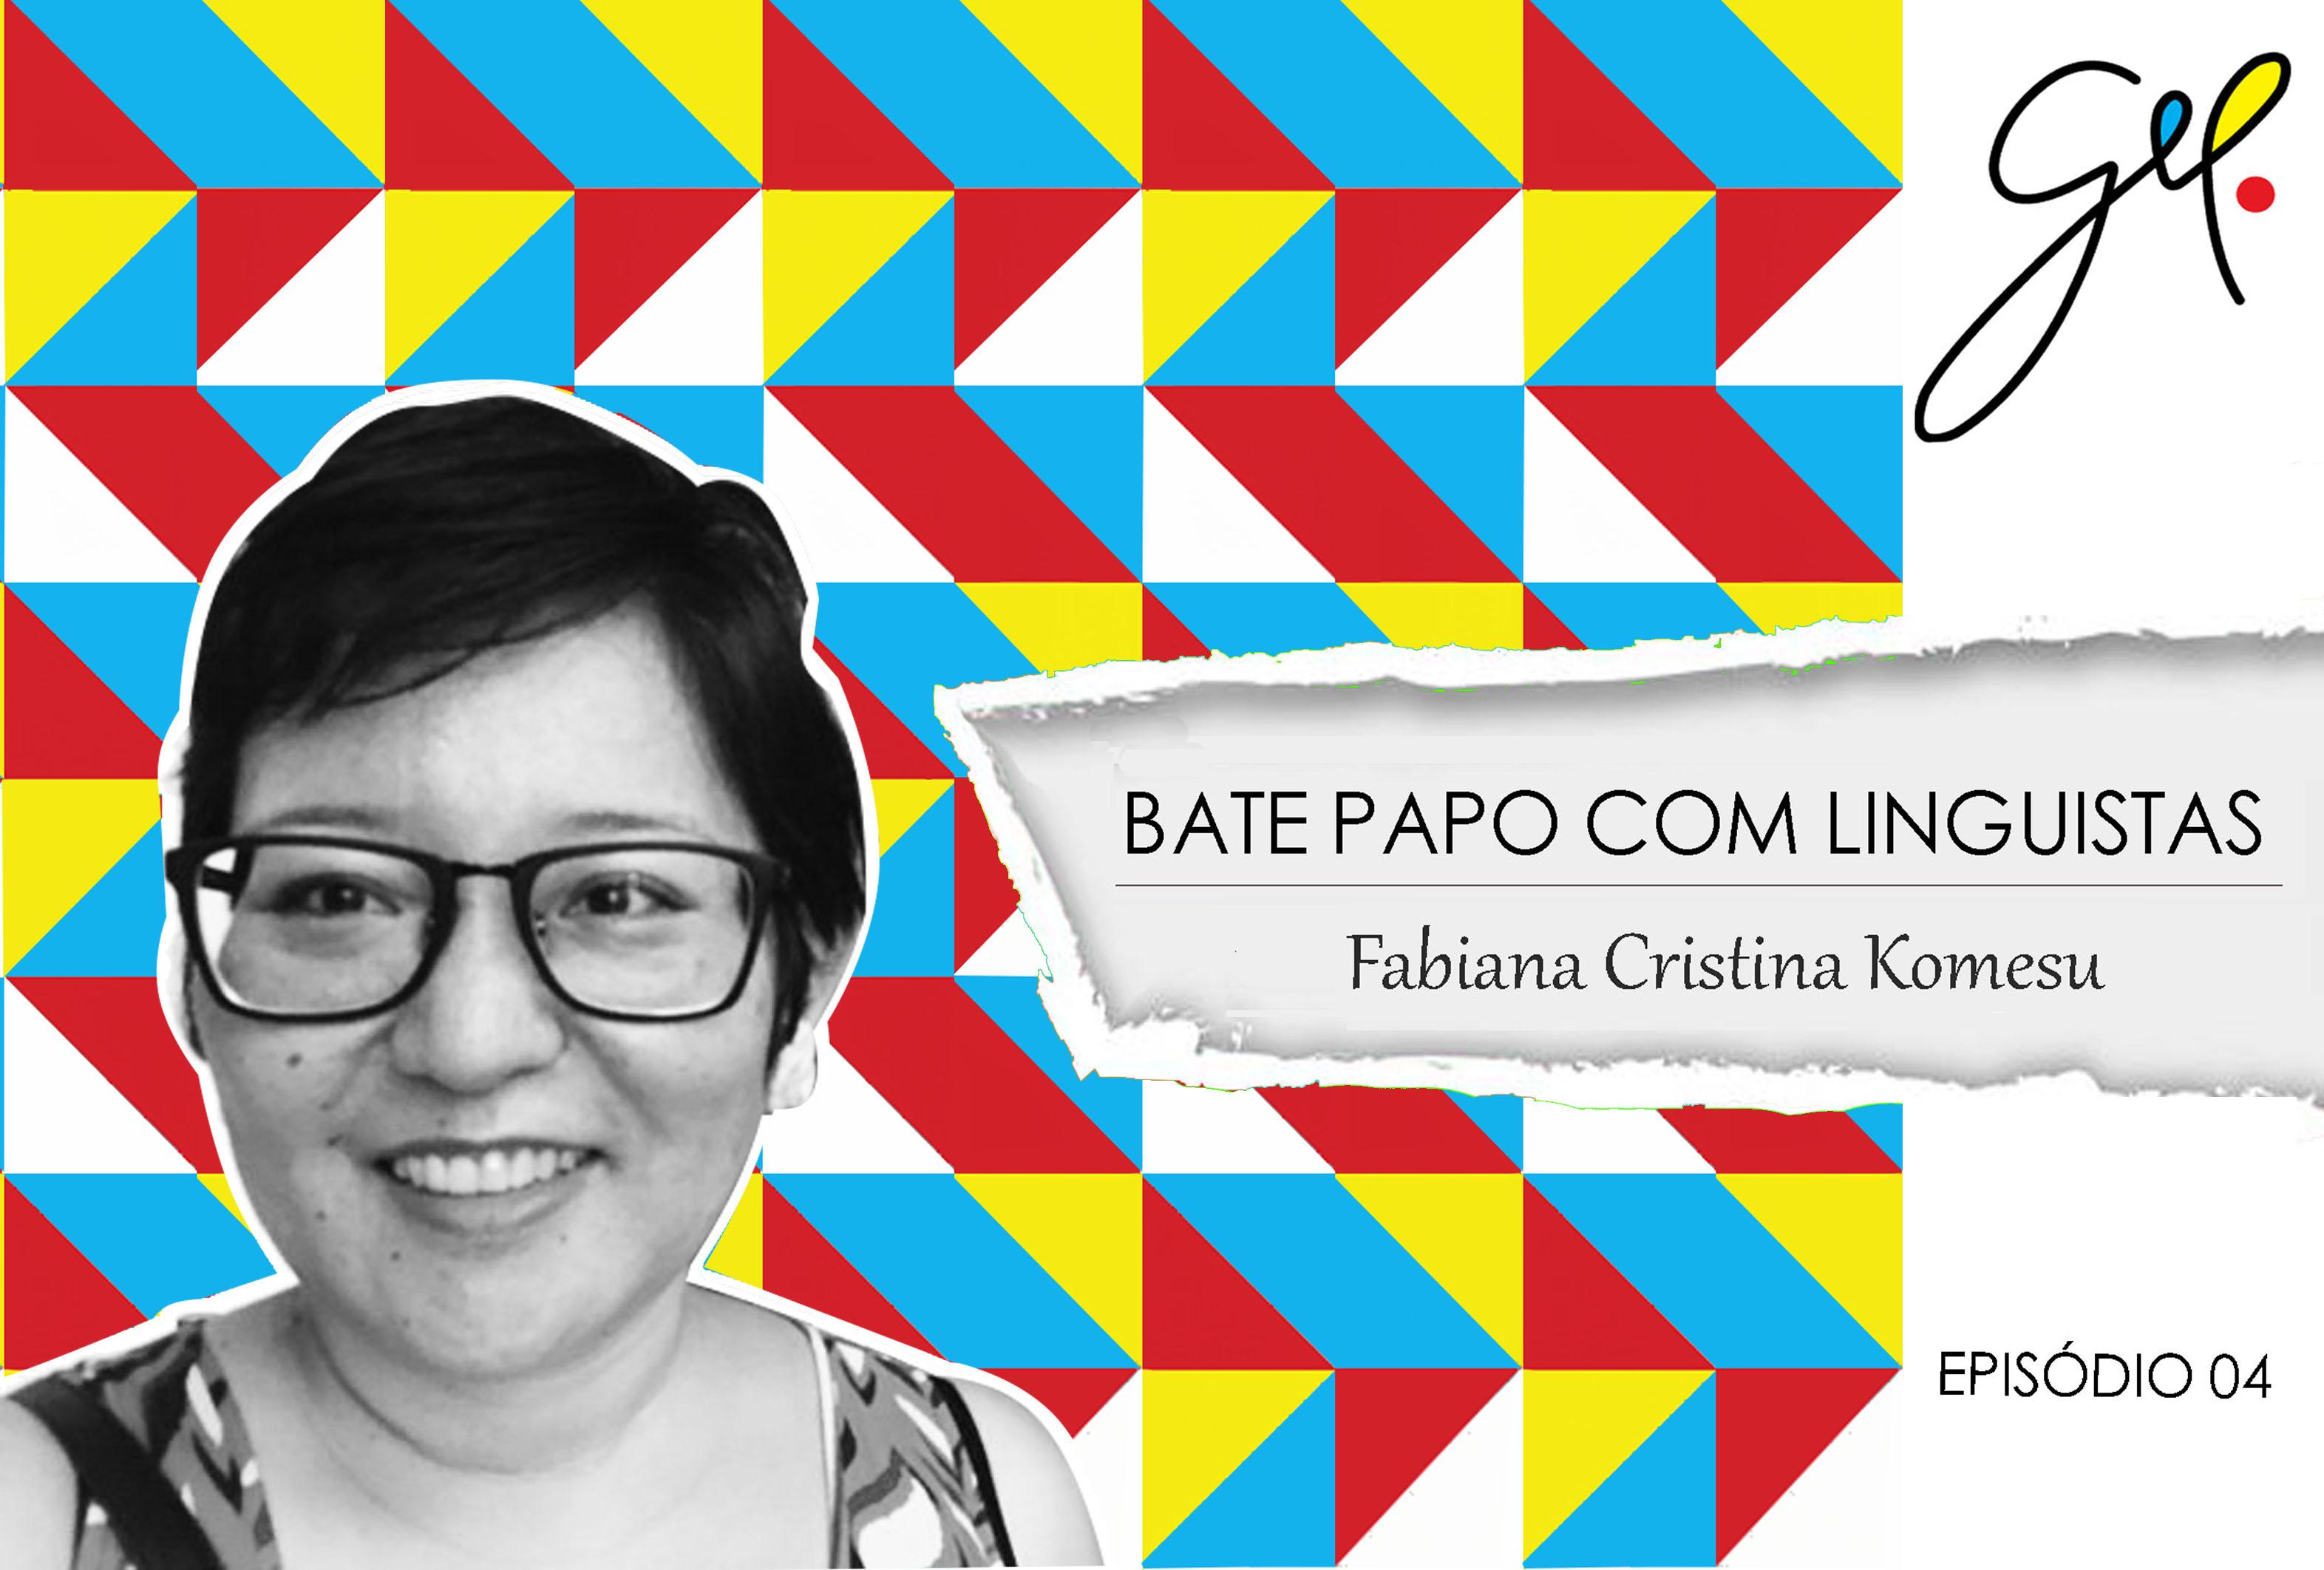 EP 04 | Conversa com Fabiana Cristina Komesu